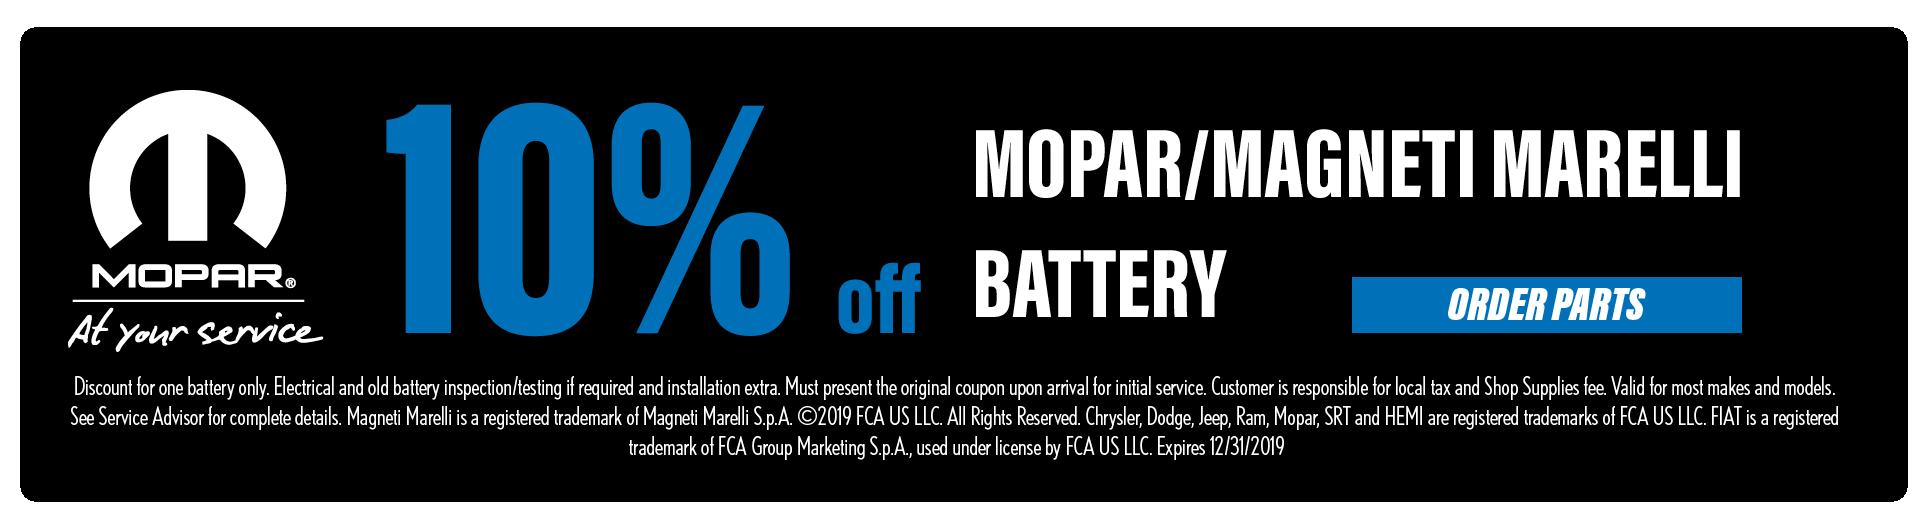 Mopar/Magneti Marelli Battery